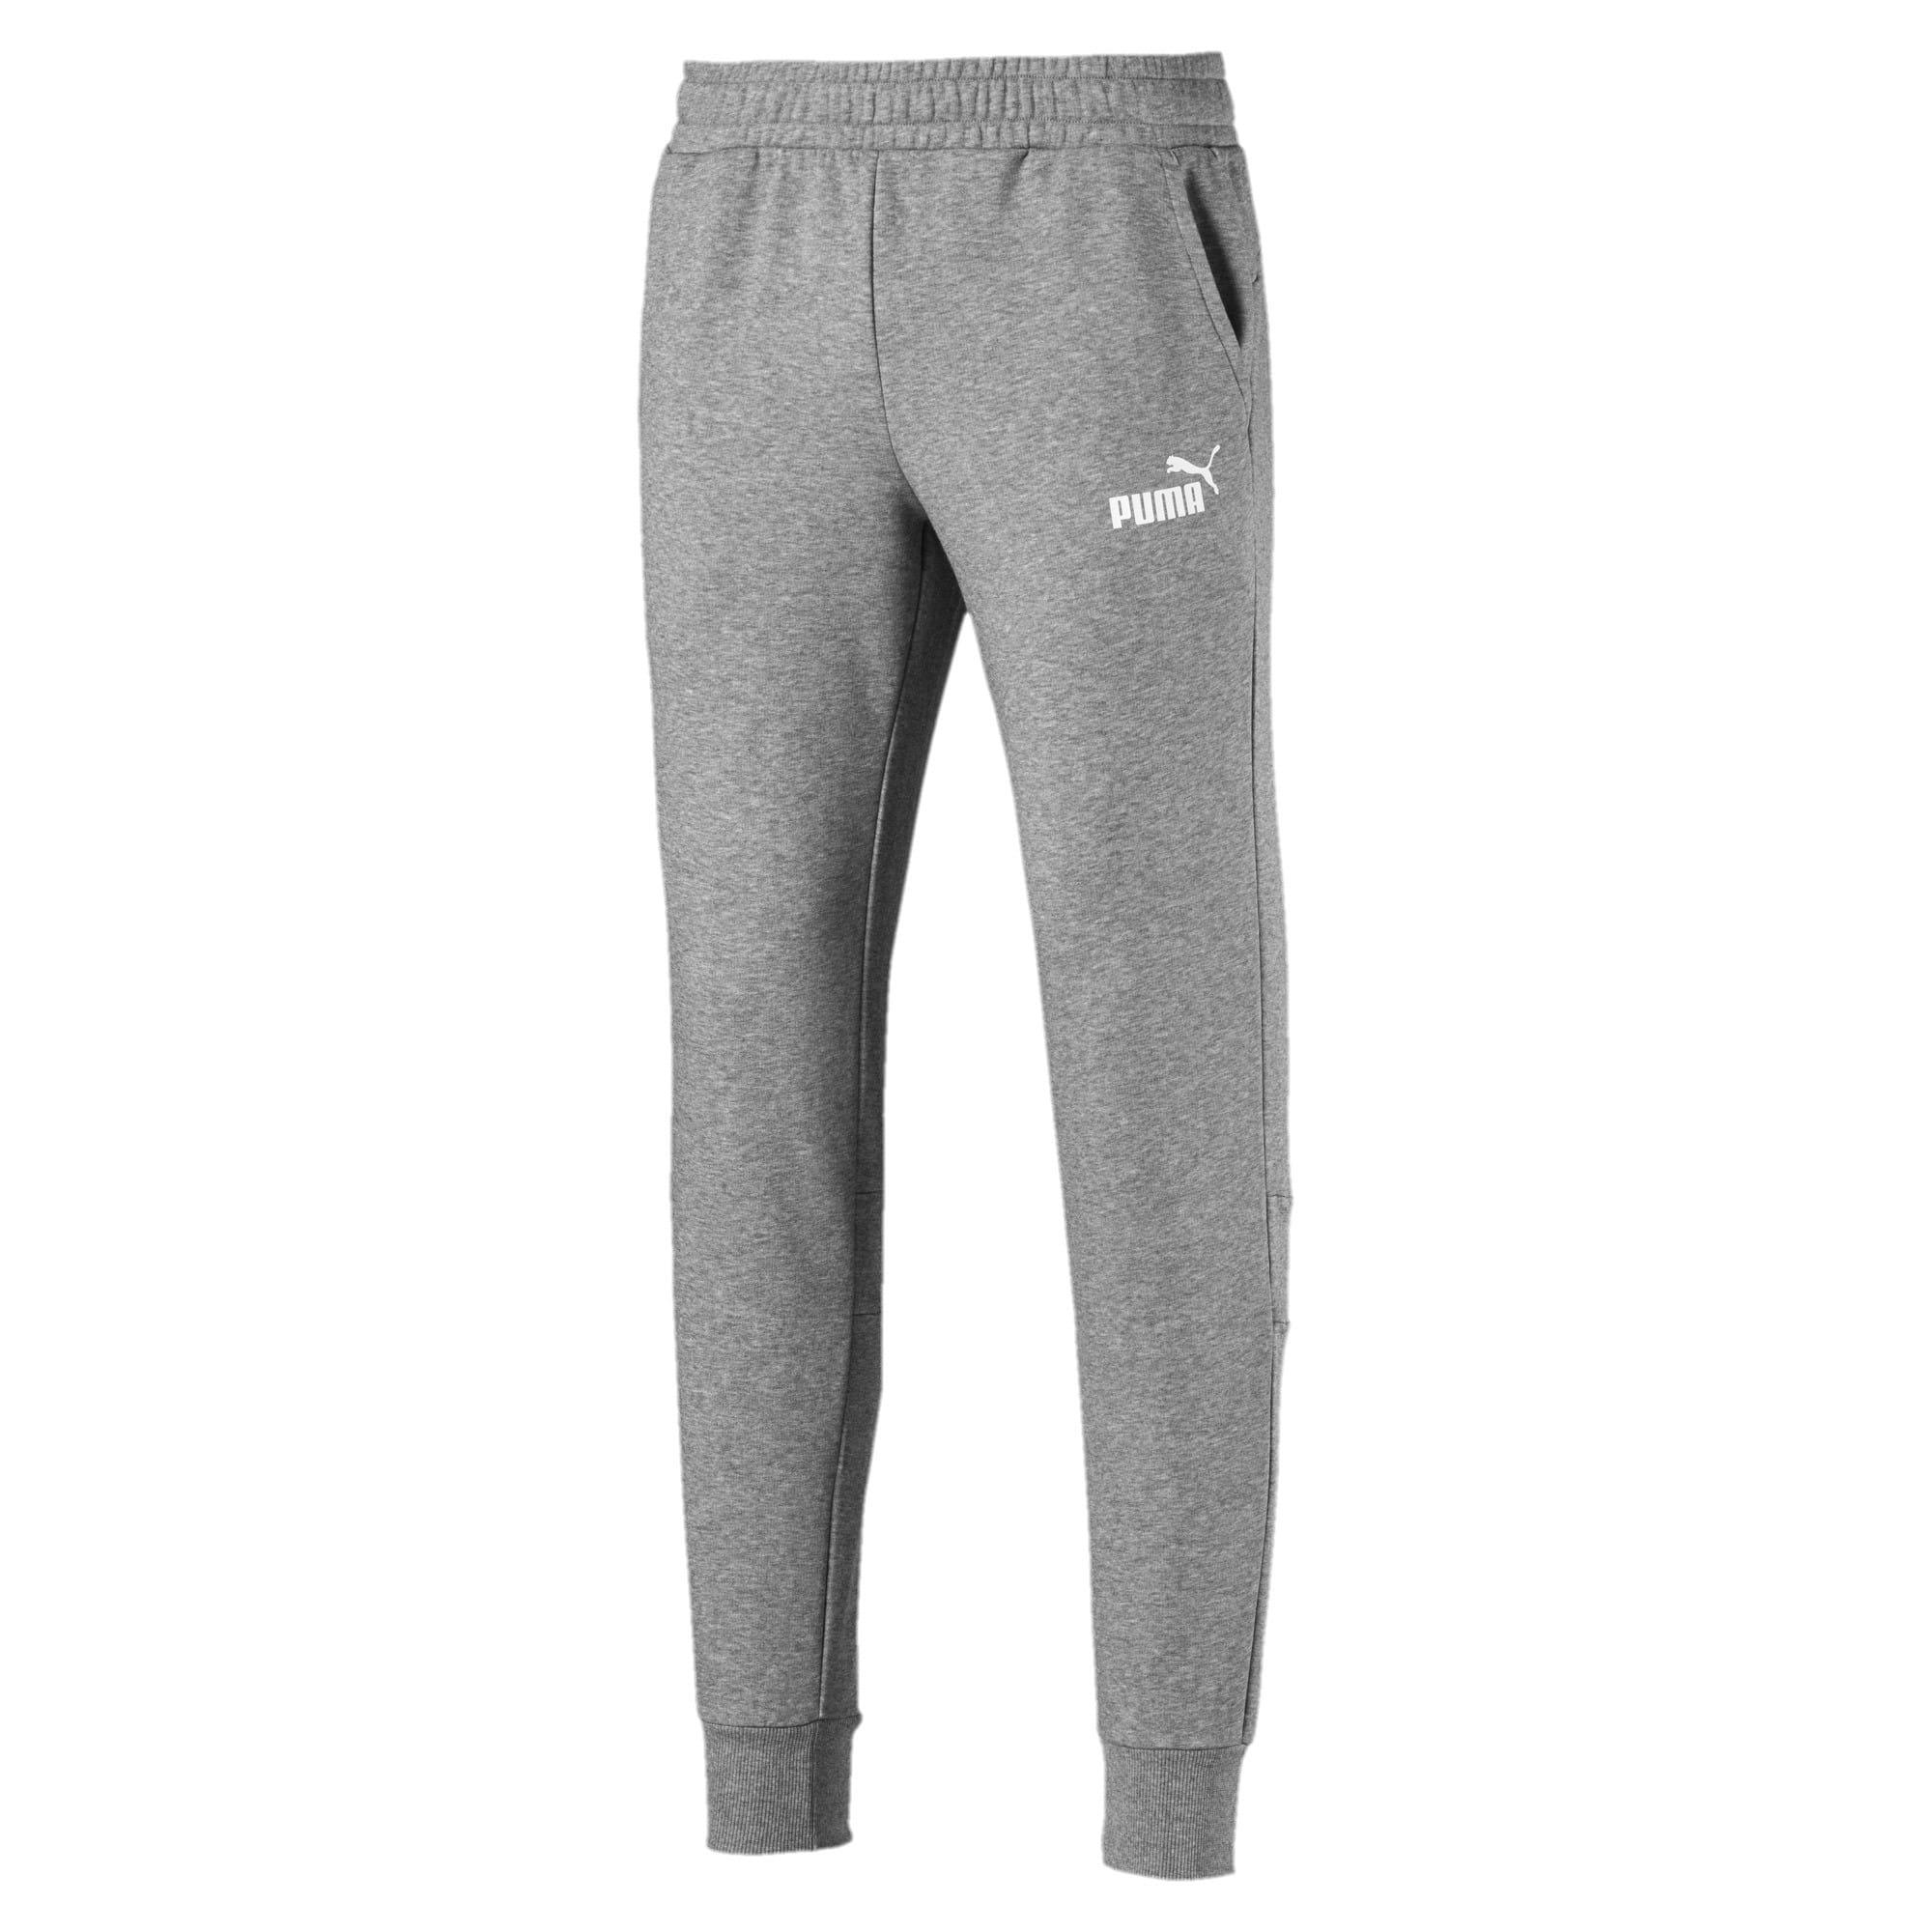 Thumbnail 5 of Amplified Men's Sweatpants, Medium Gray Heather, medium